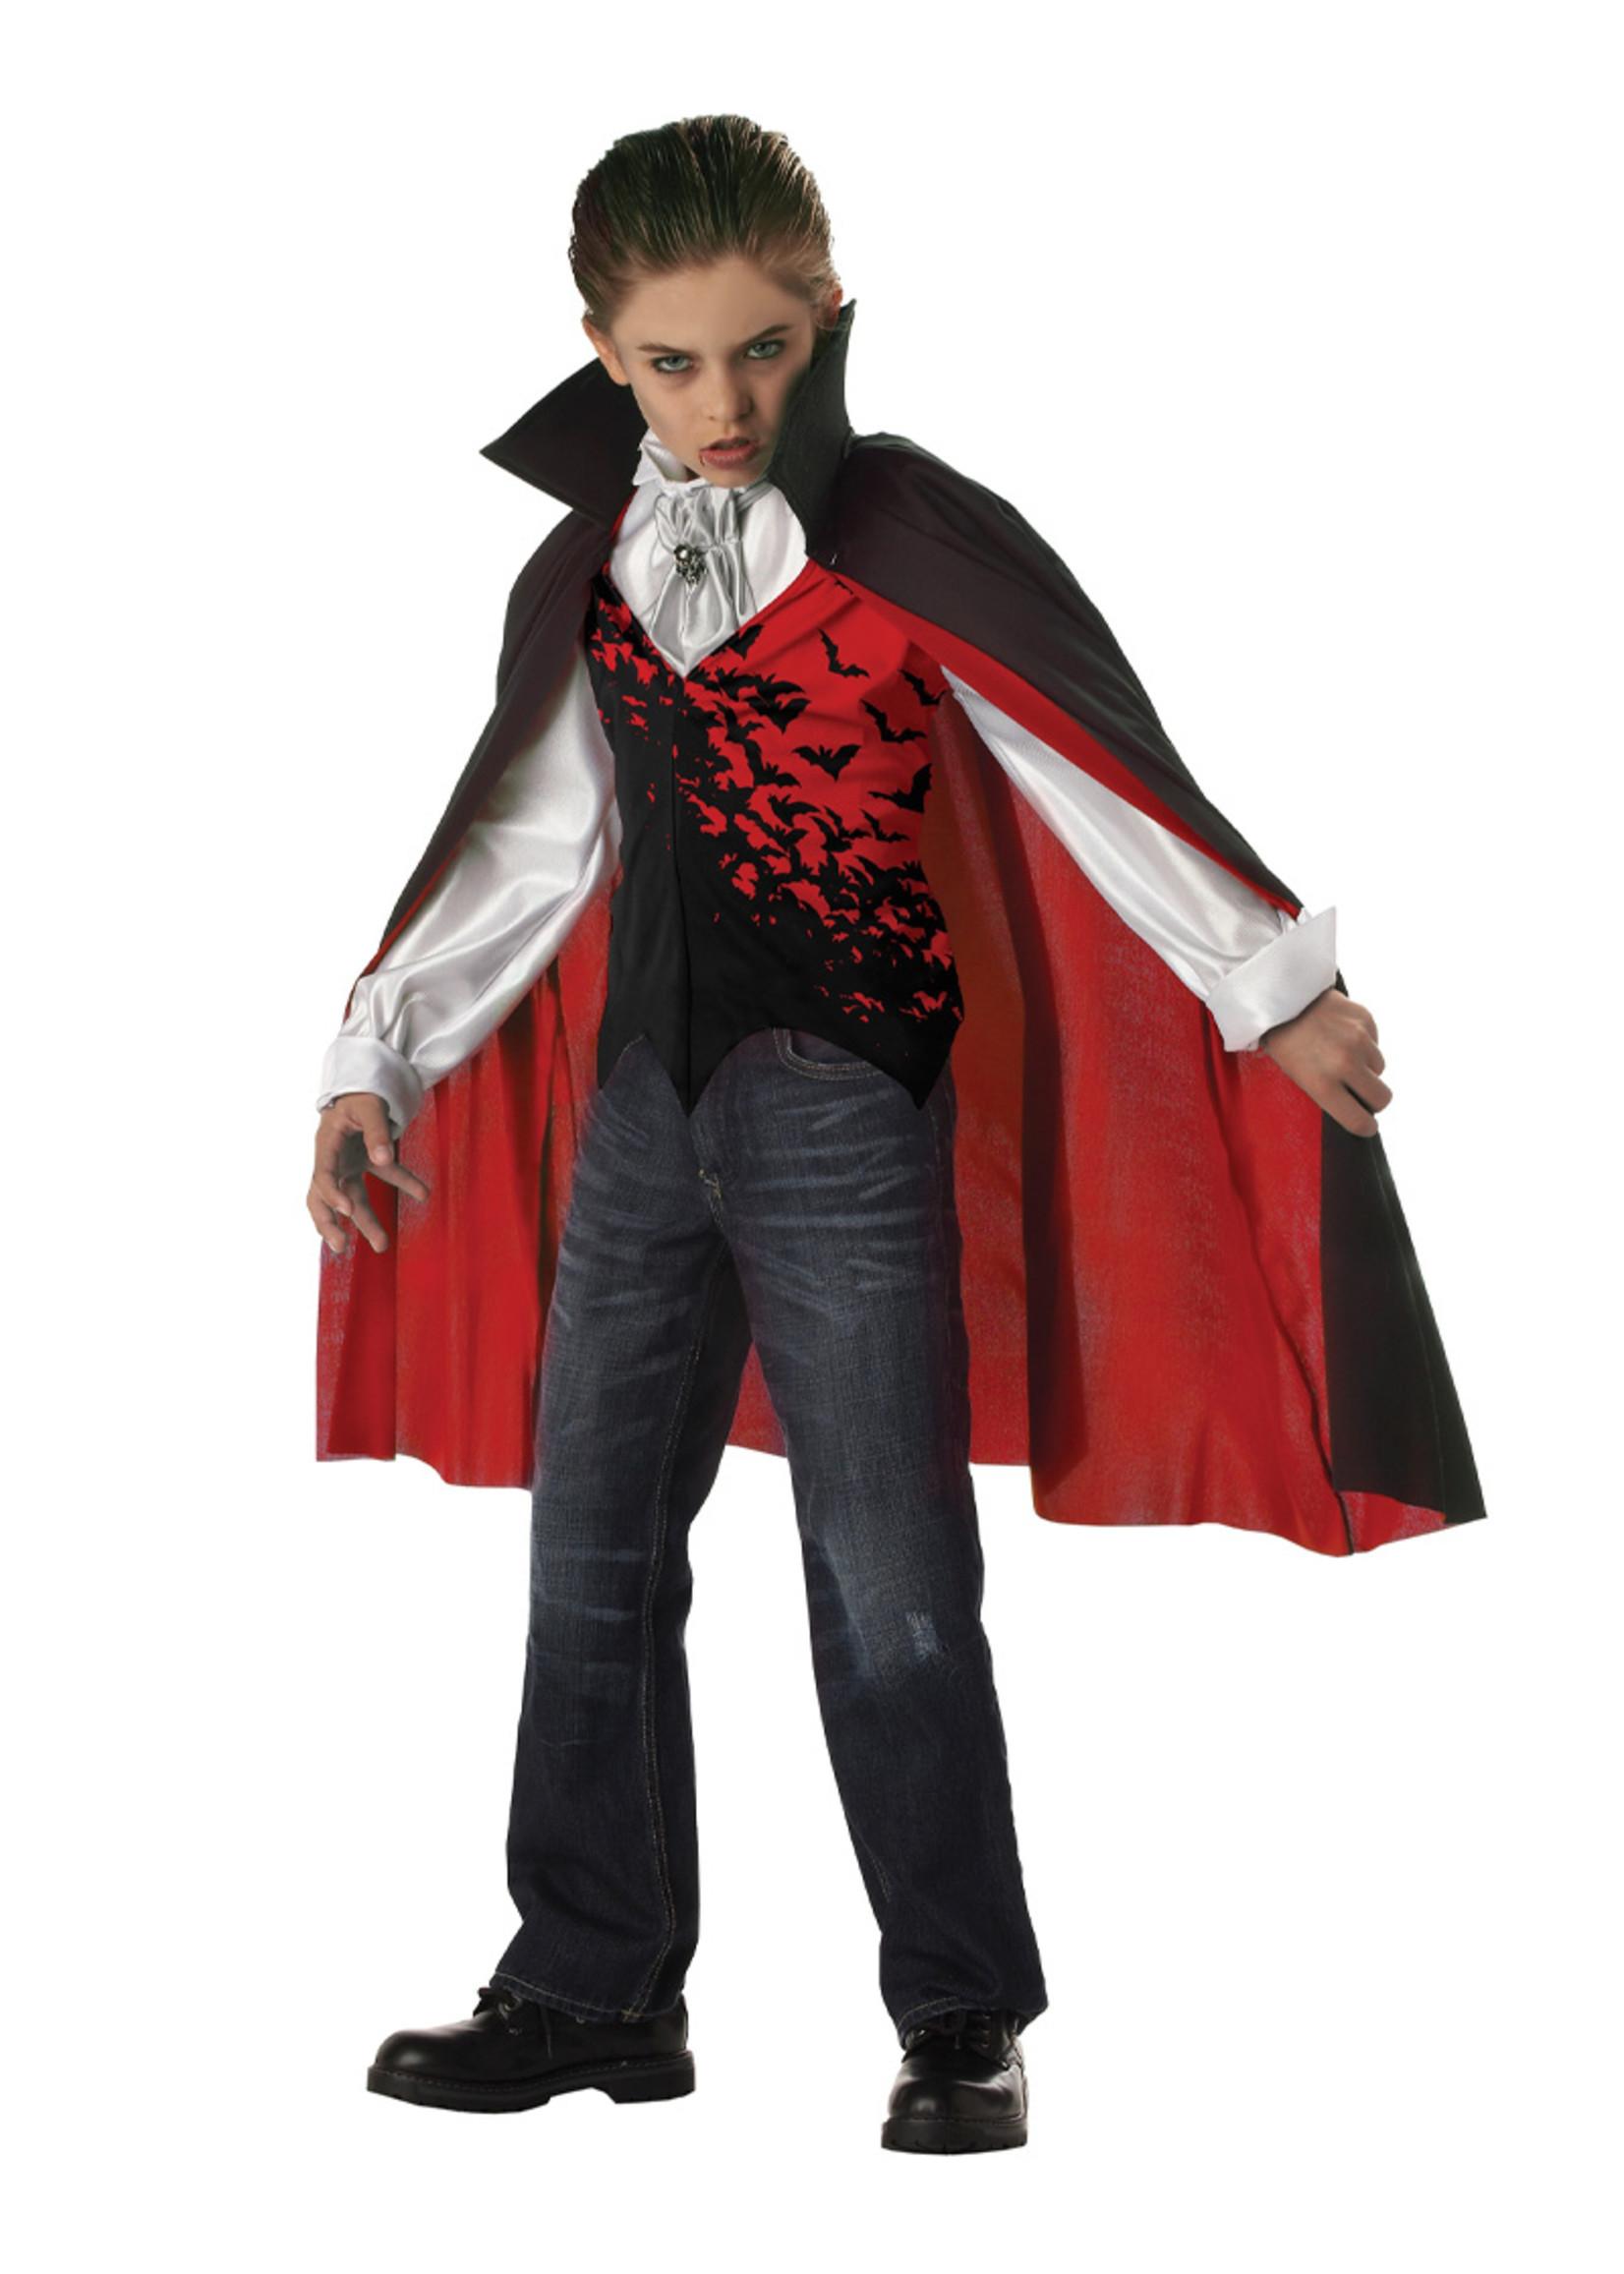 Prince of Darkness Costume - Boys